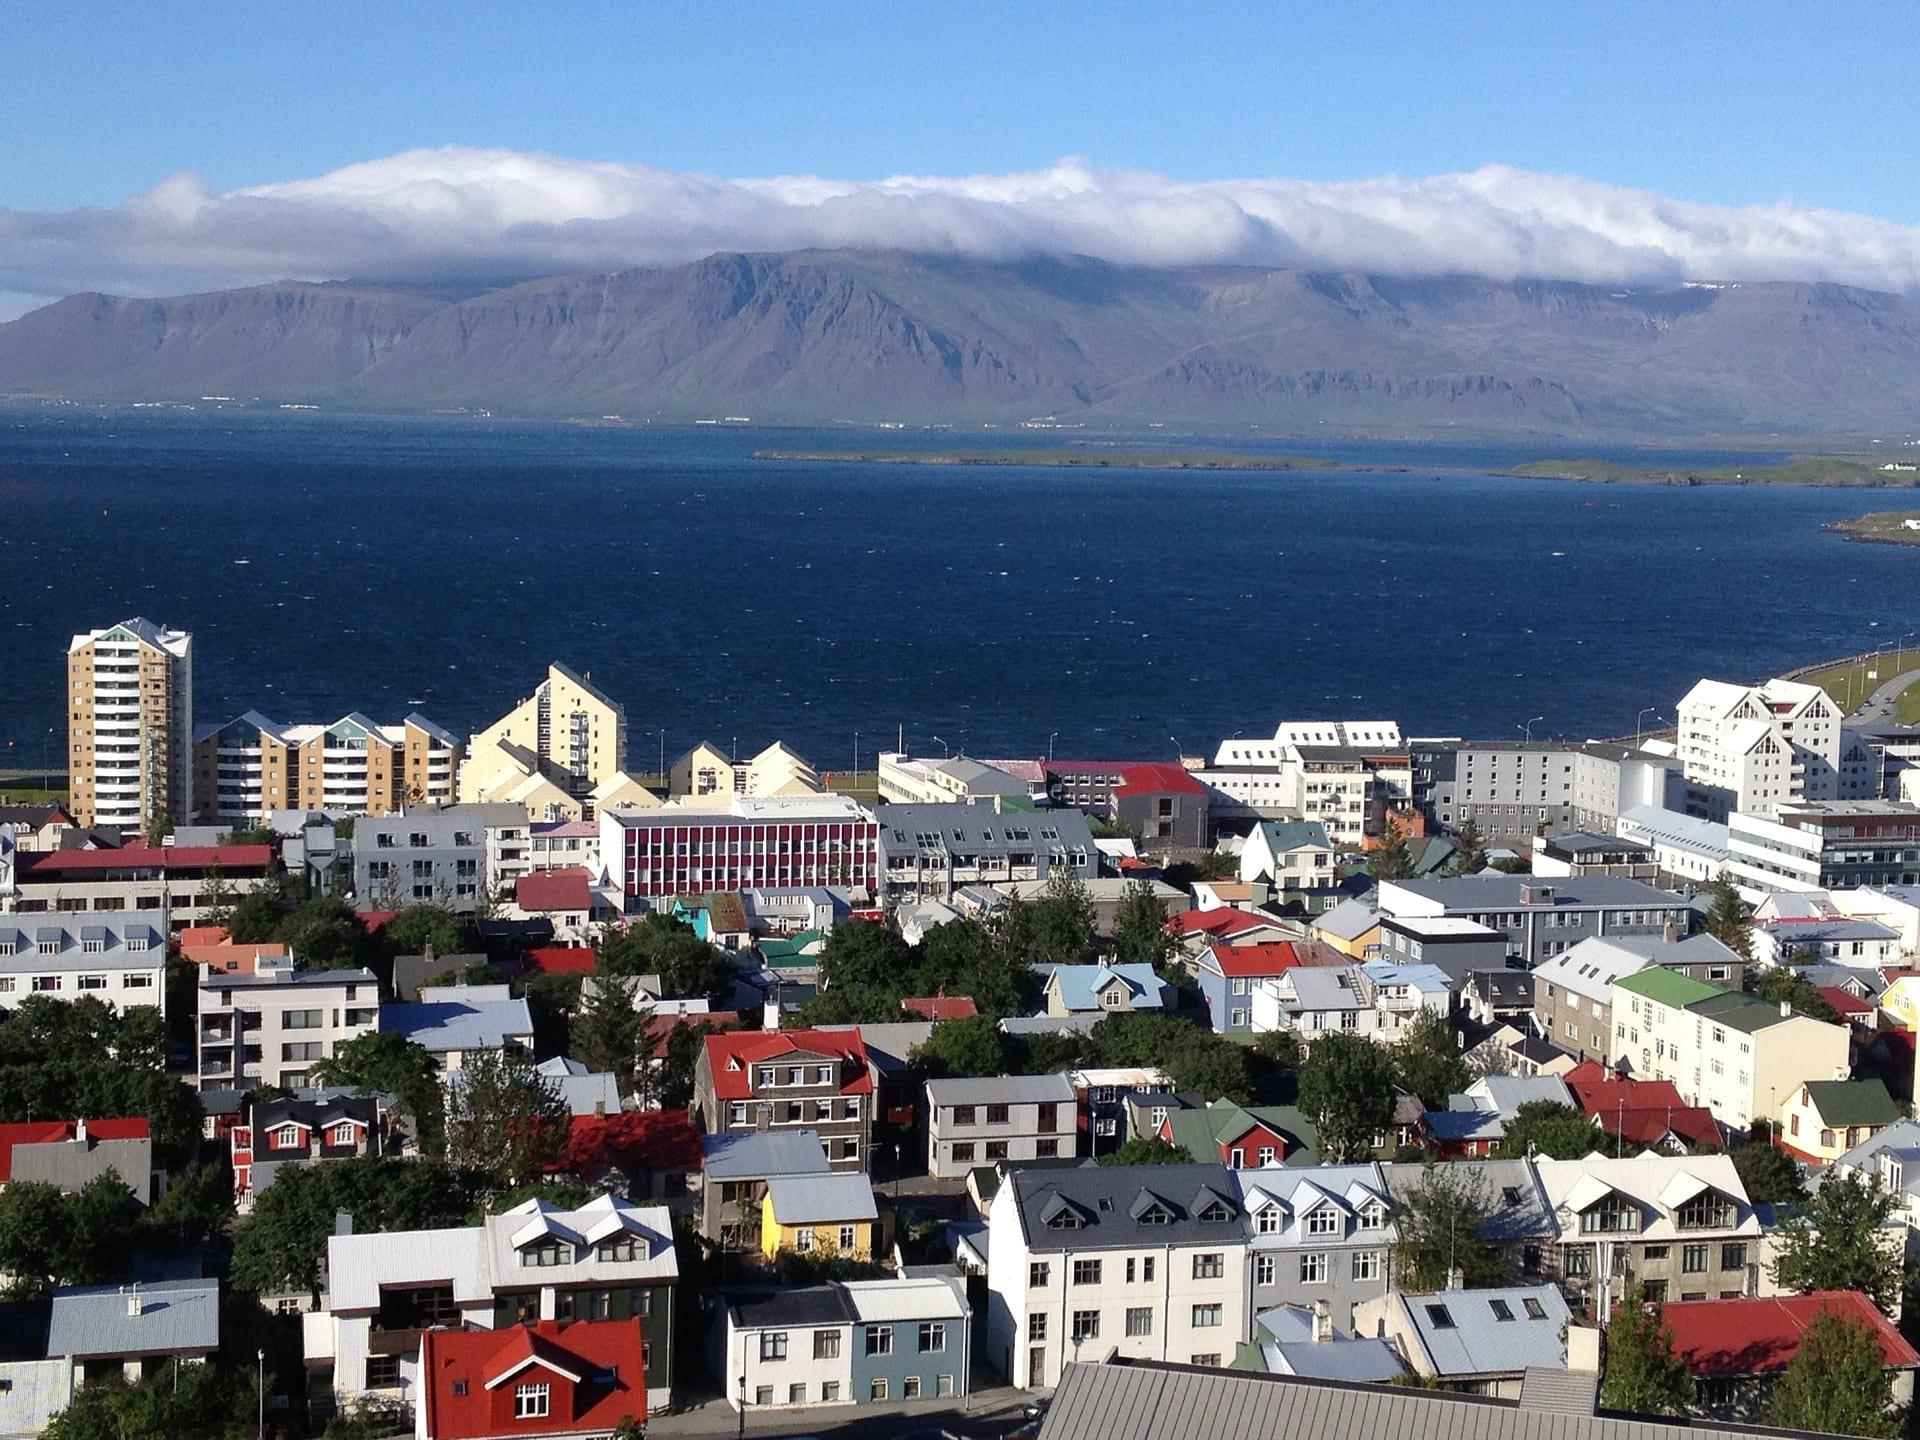 Reykjavik with Mount Esja